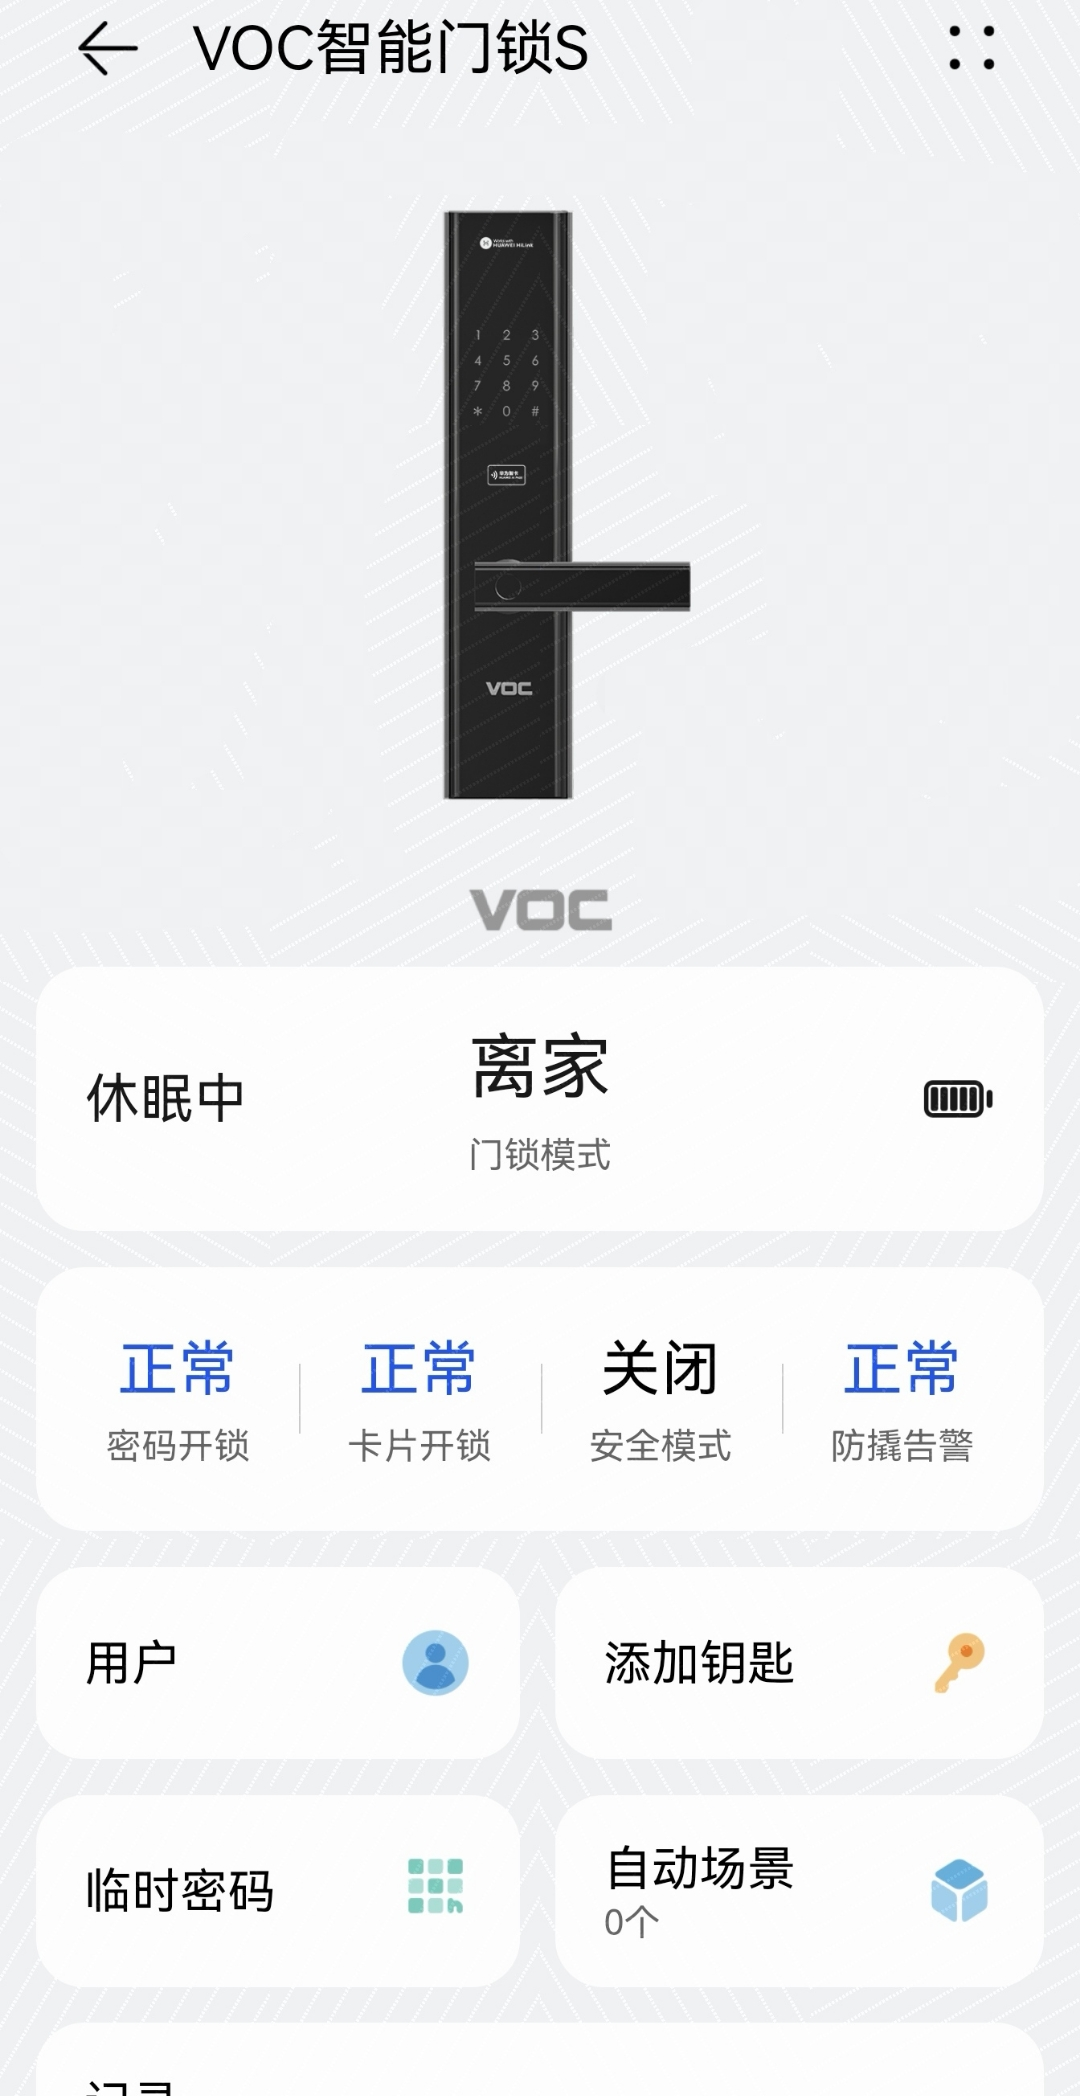 Screenshot_20210522_151701_com.huawei.smarthome_edit_44465490292172.jpg